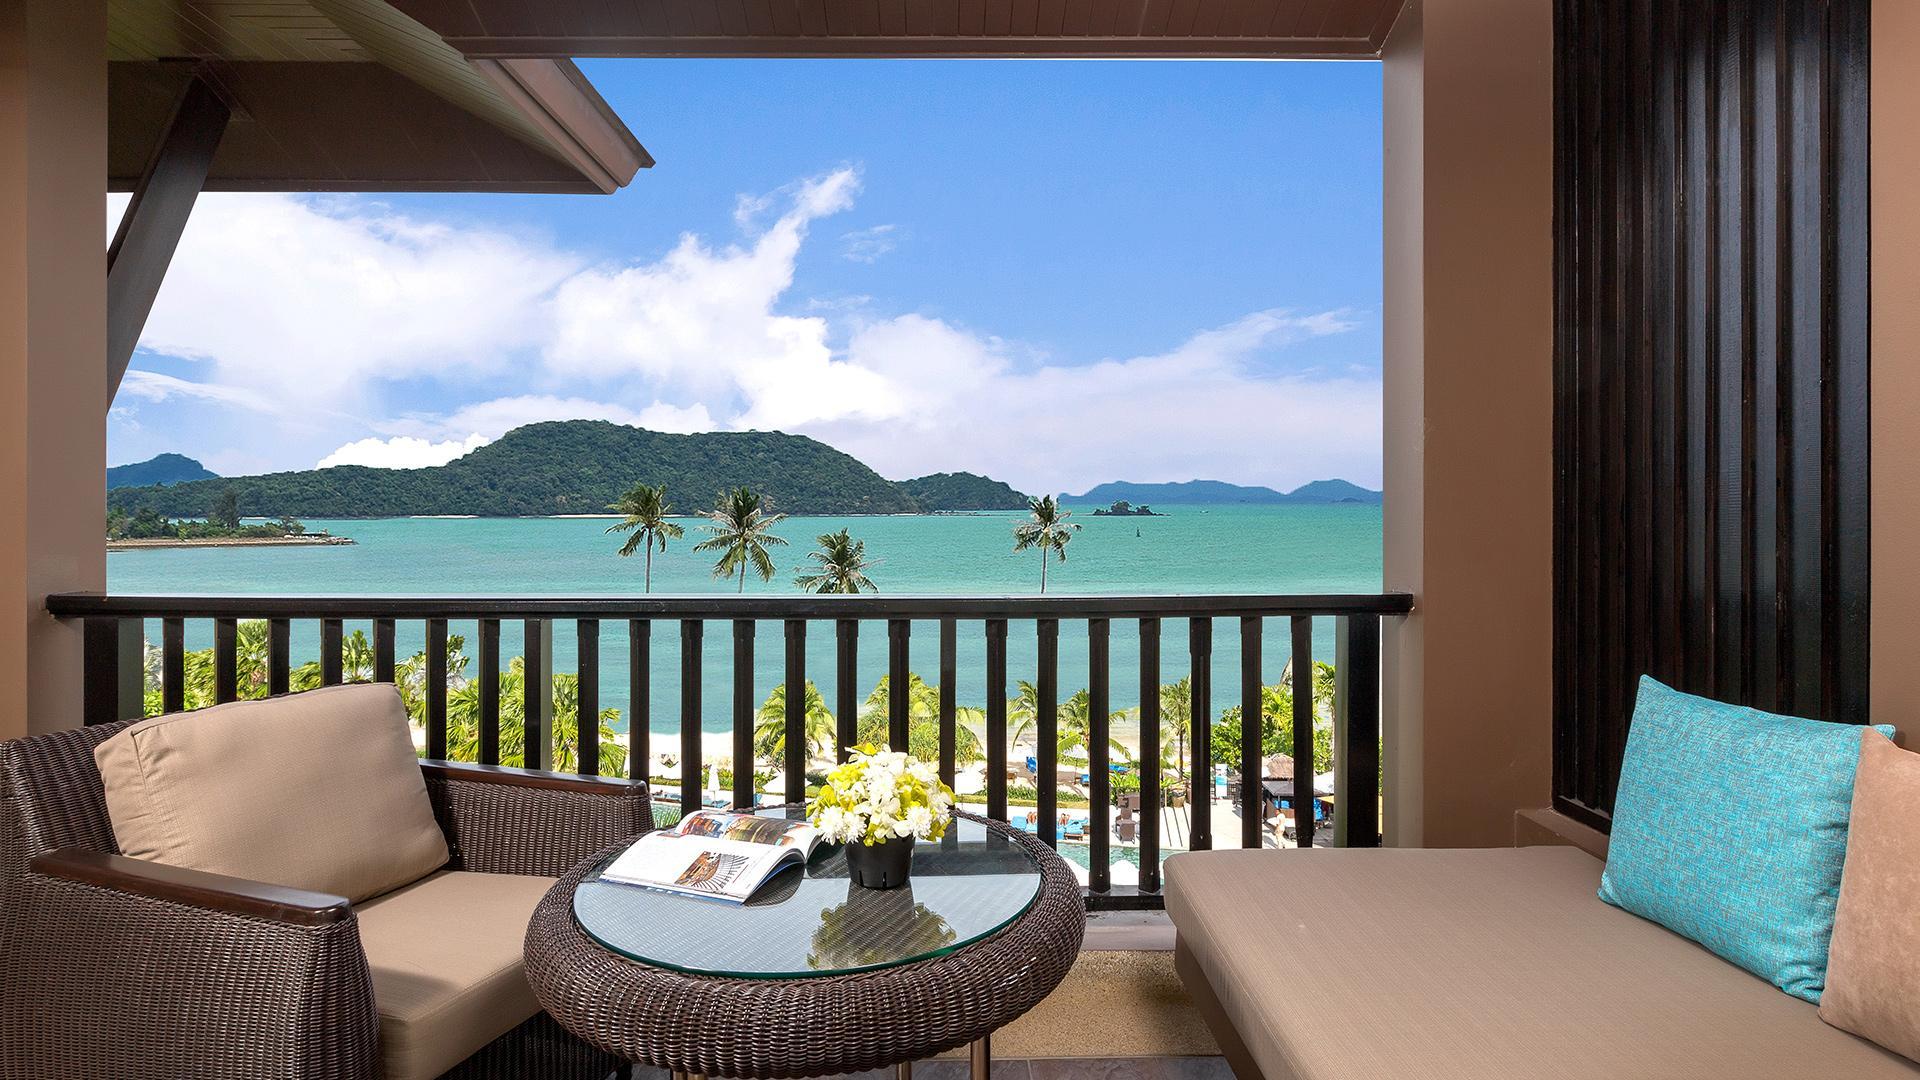 Deluxe Room with Sea View image 1 at Pullman Phuket Panwa Beach Resort by Amphoe Mueang Phuket, Chang Wat Phuket, Thailand